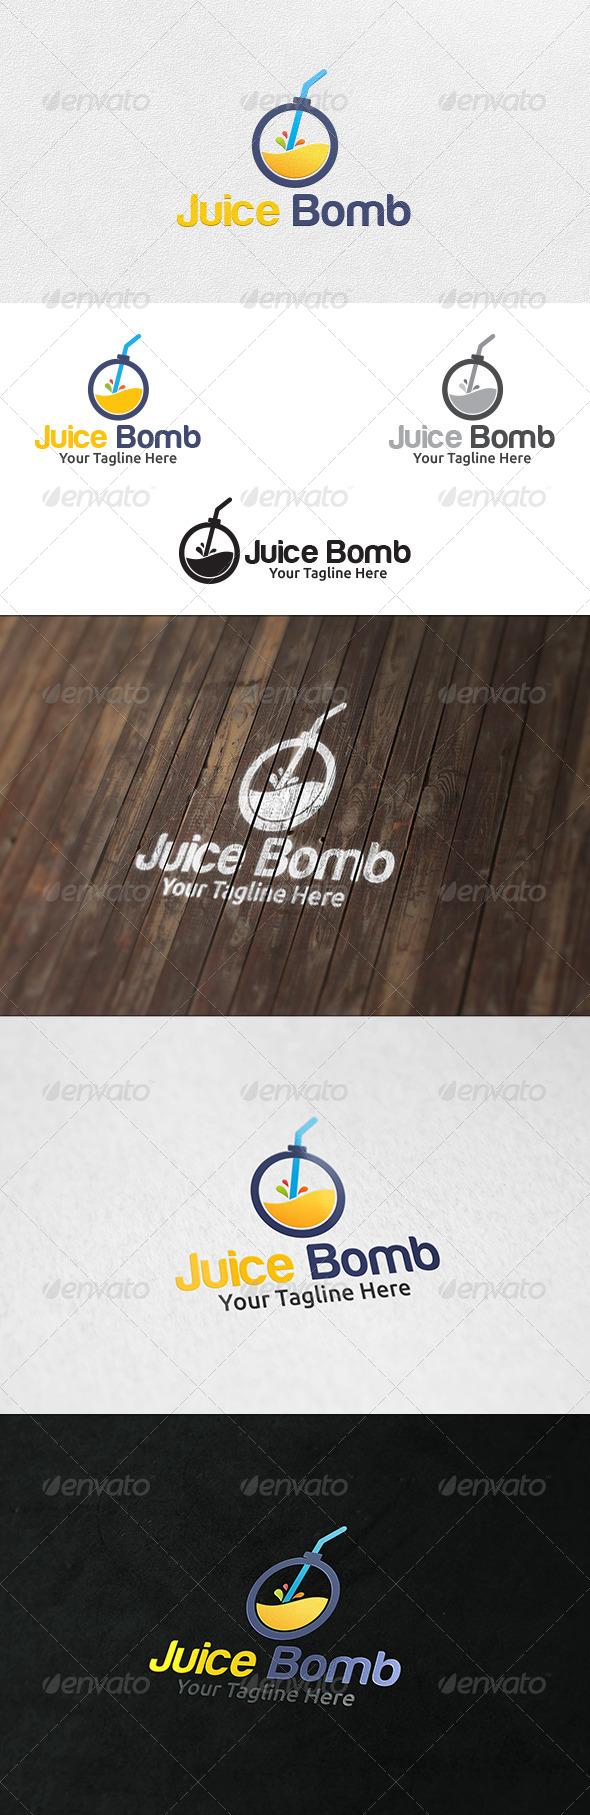 GraphicRiver Juice Bomb Logo Template 6602764